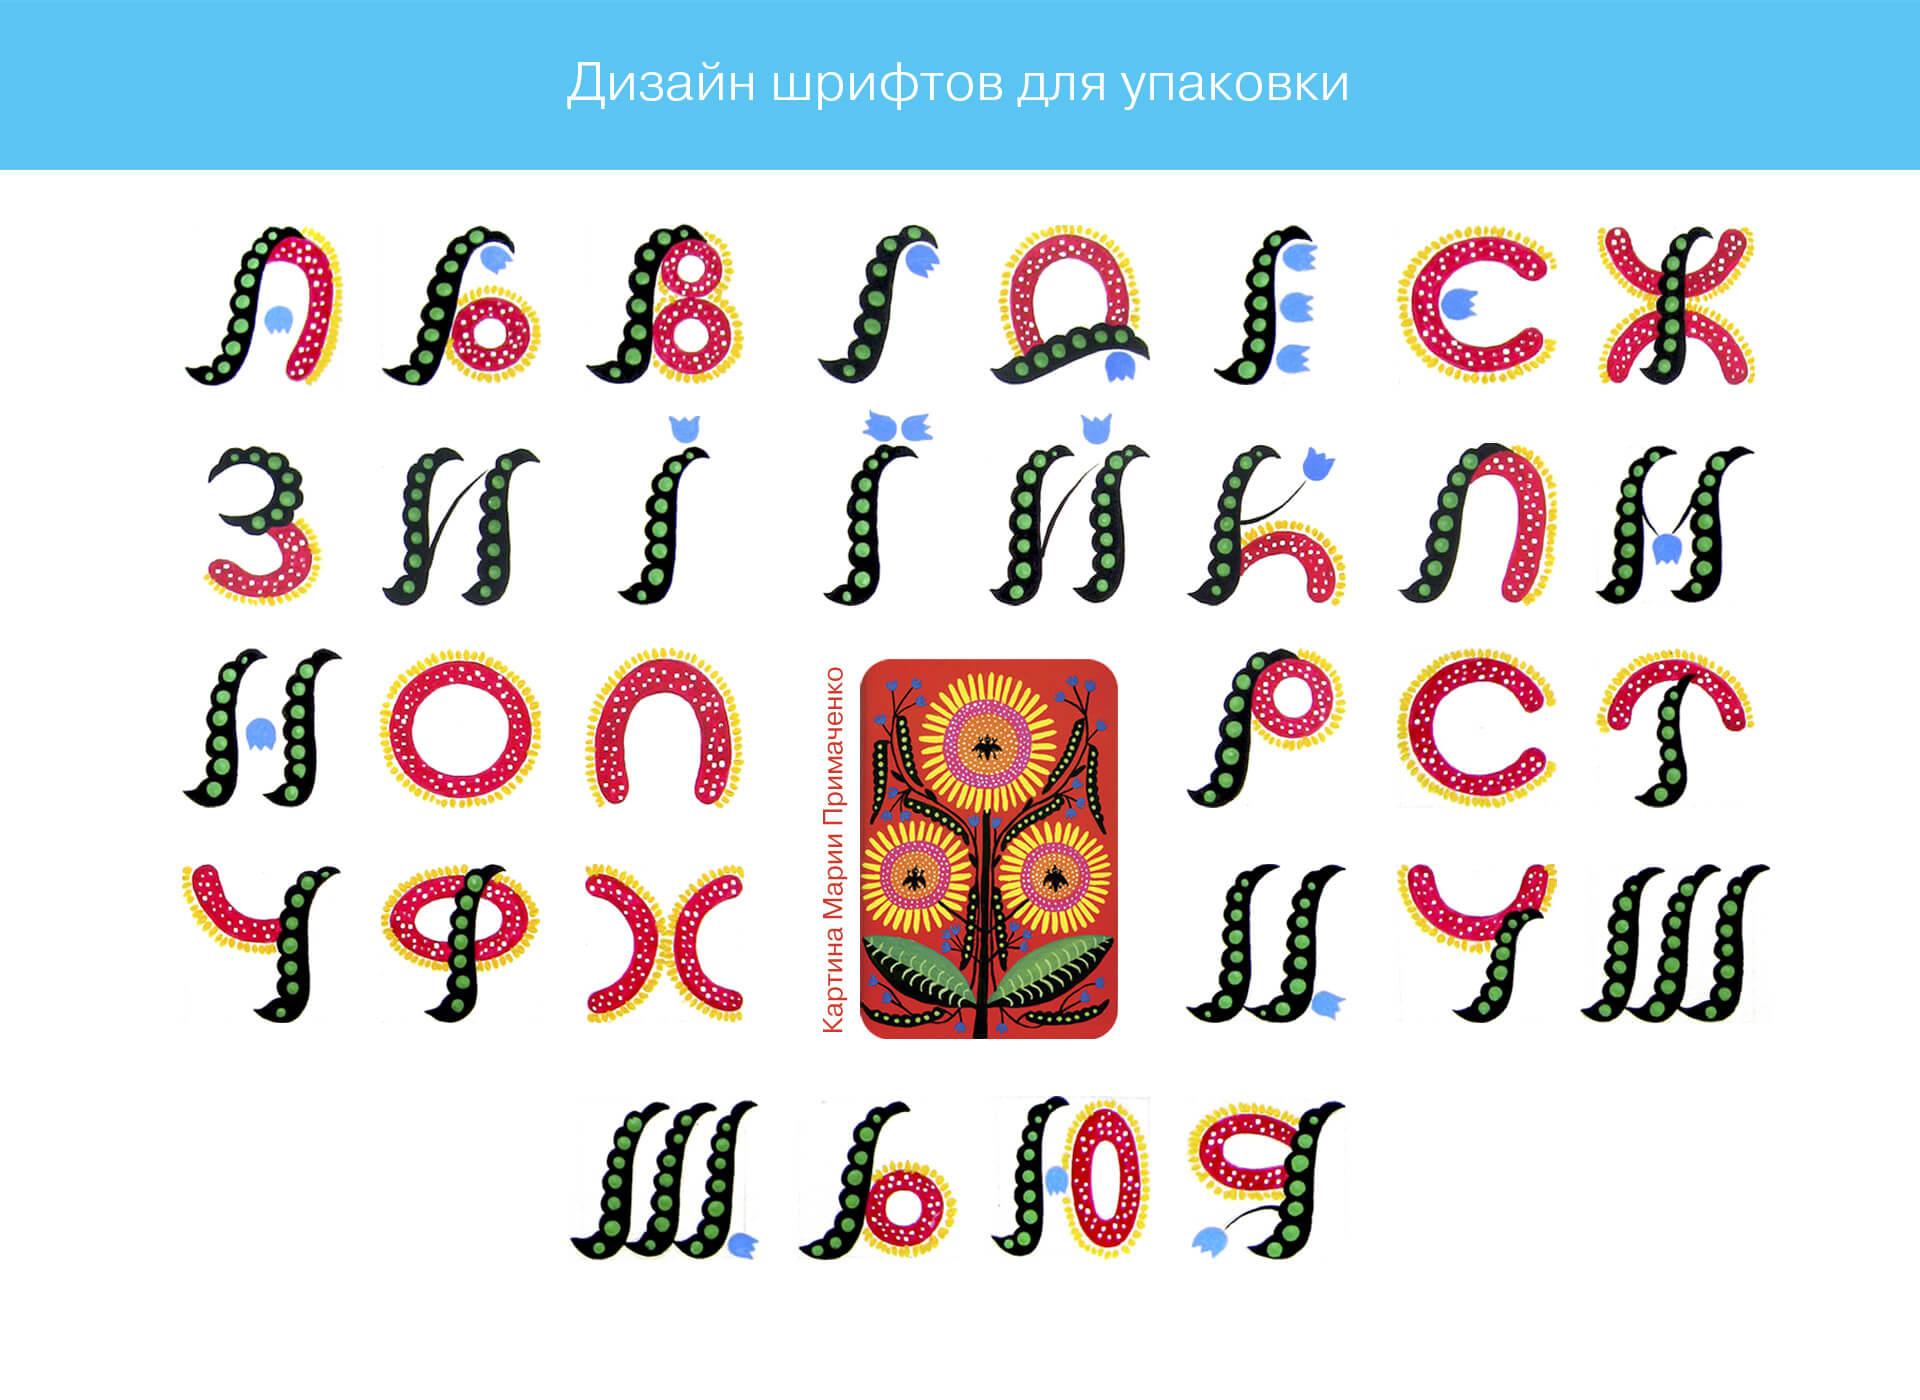 Prokochuk_Irina_font design_5